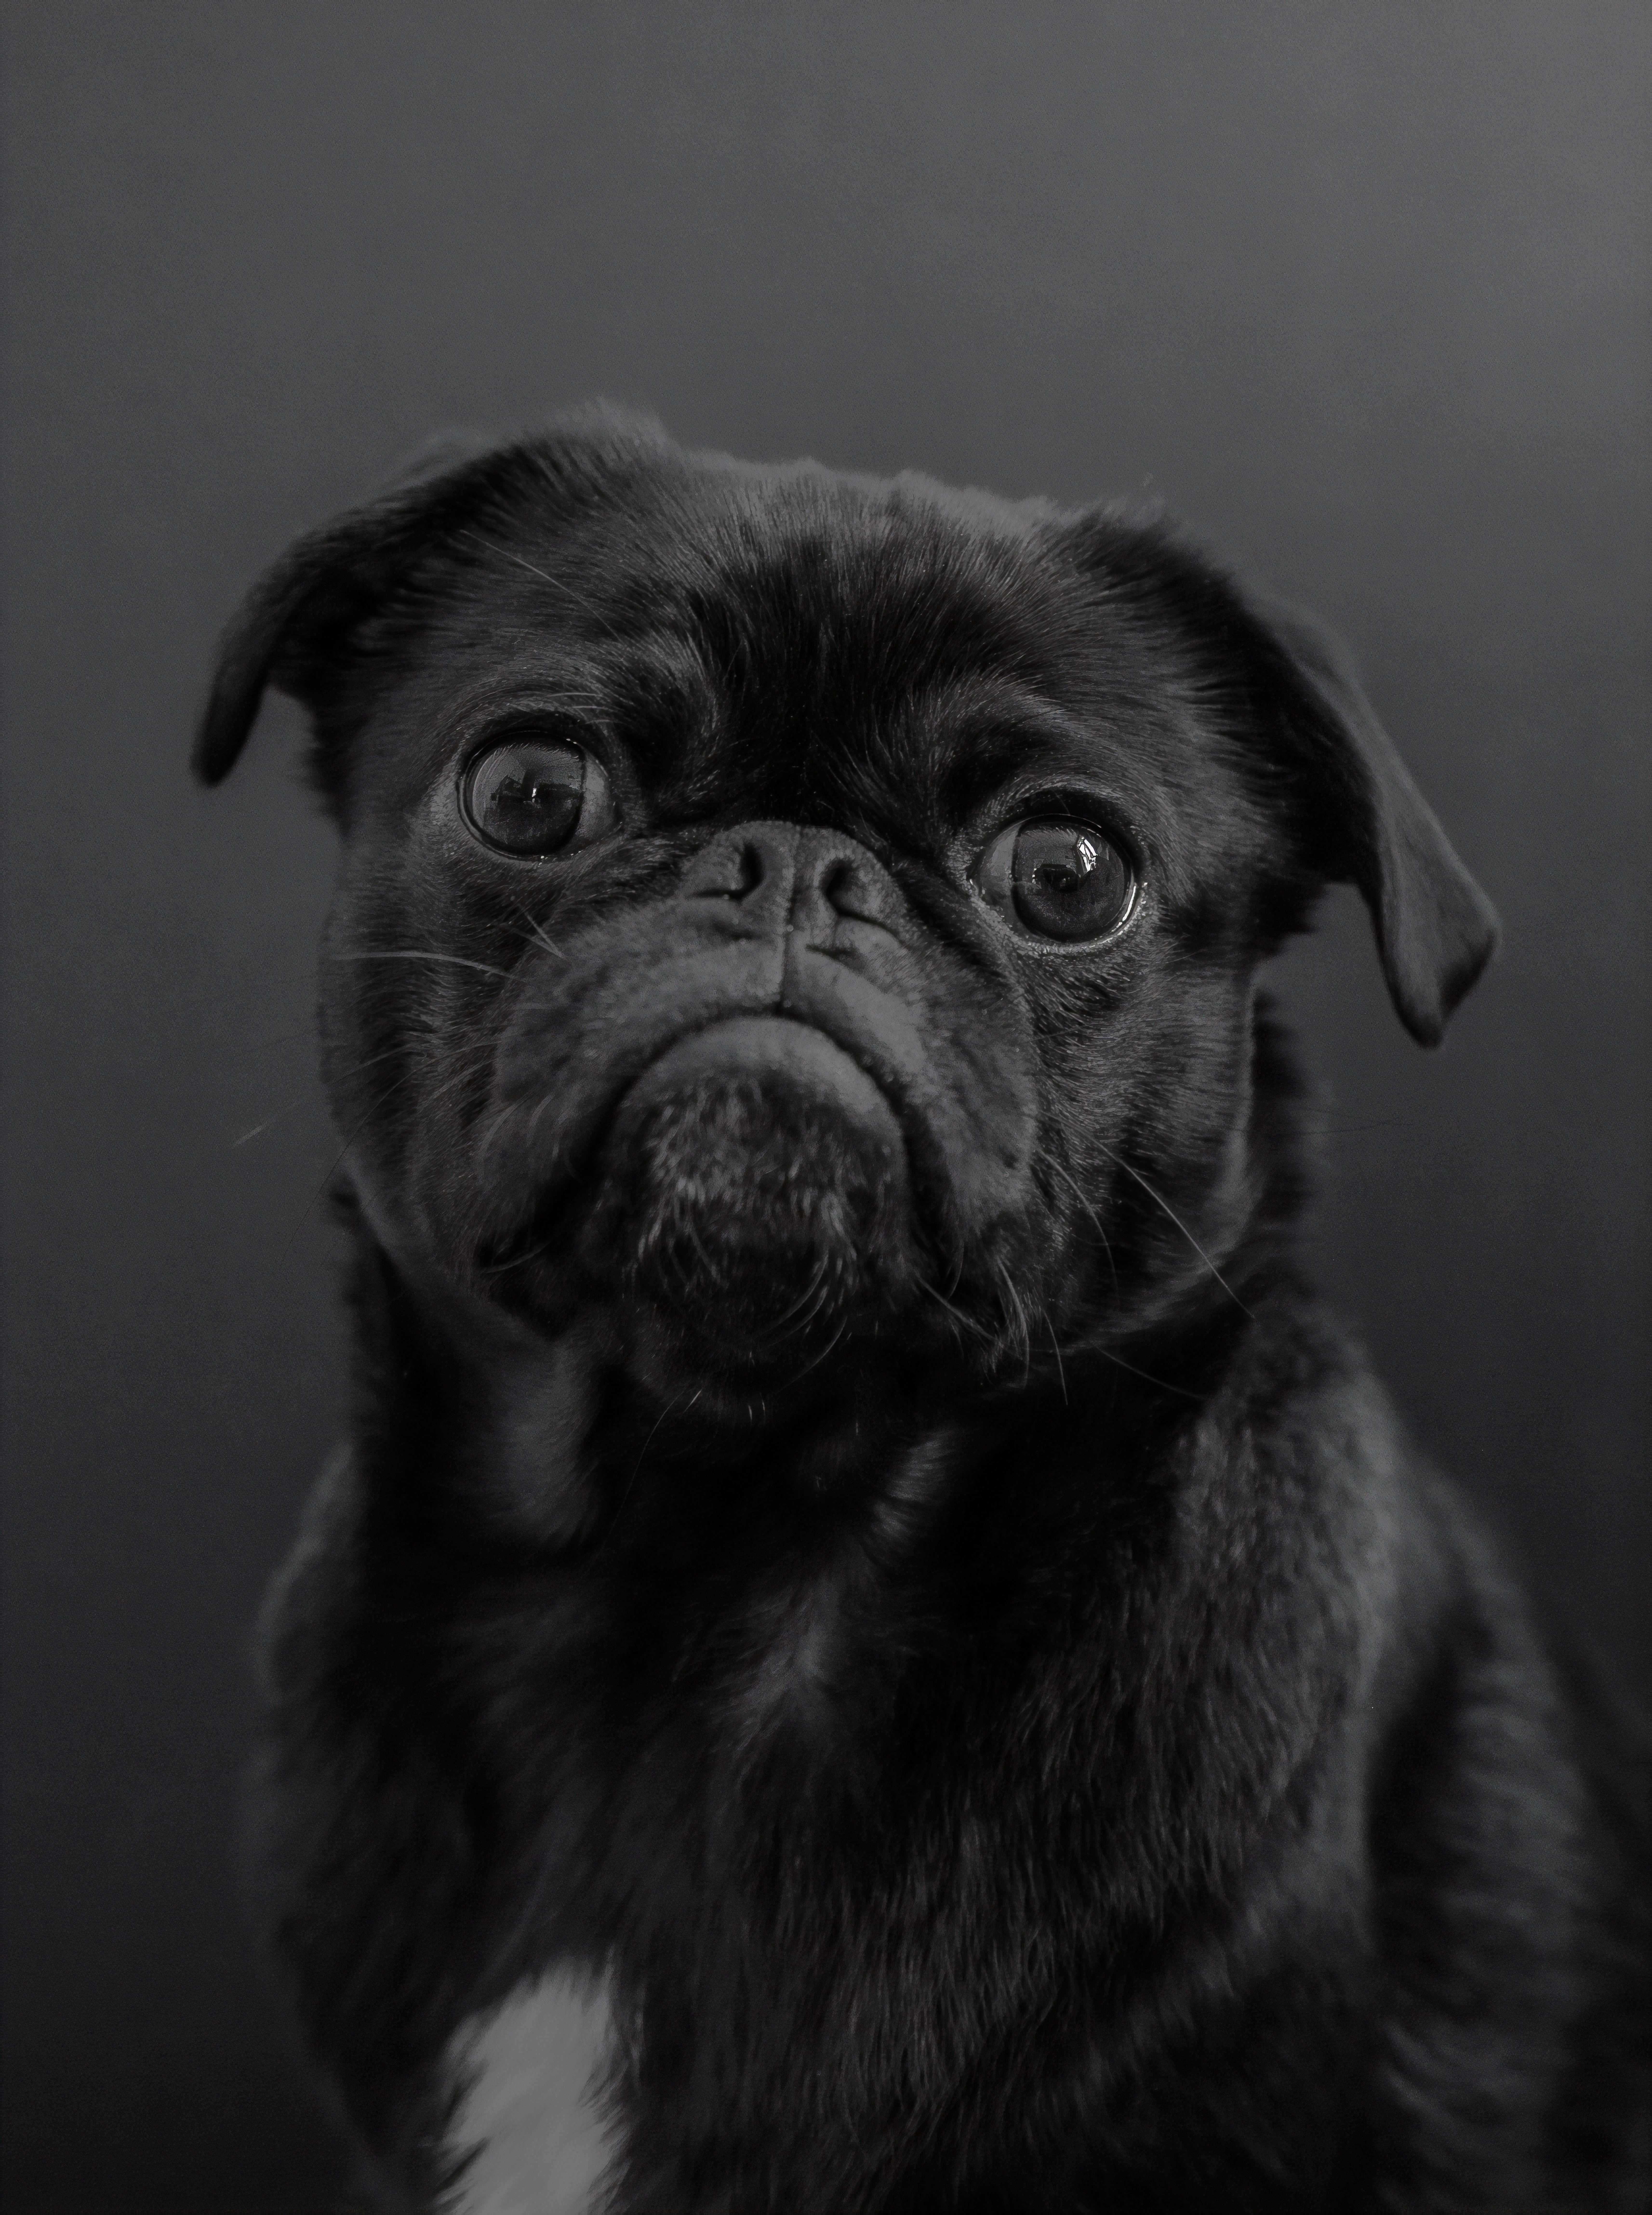 999898 Puppies Cute Puppies Black Pug Puppies